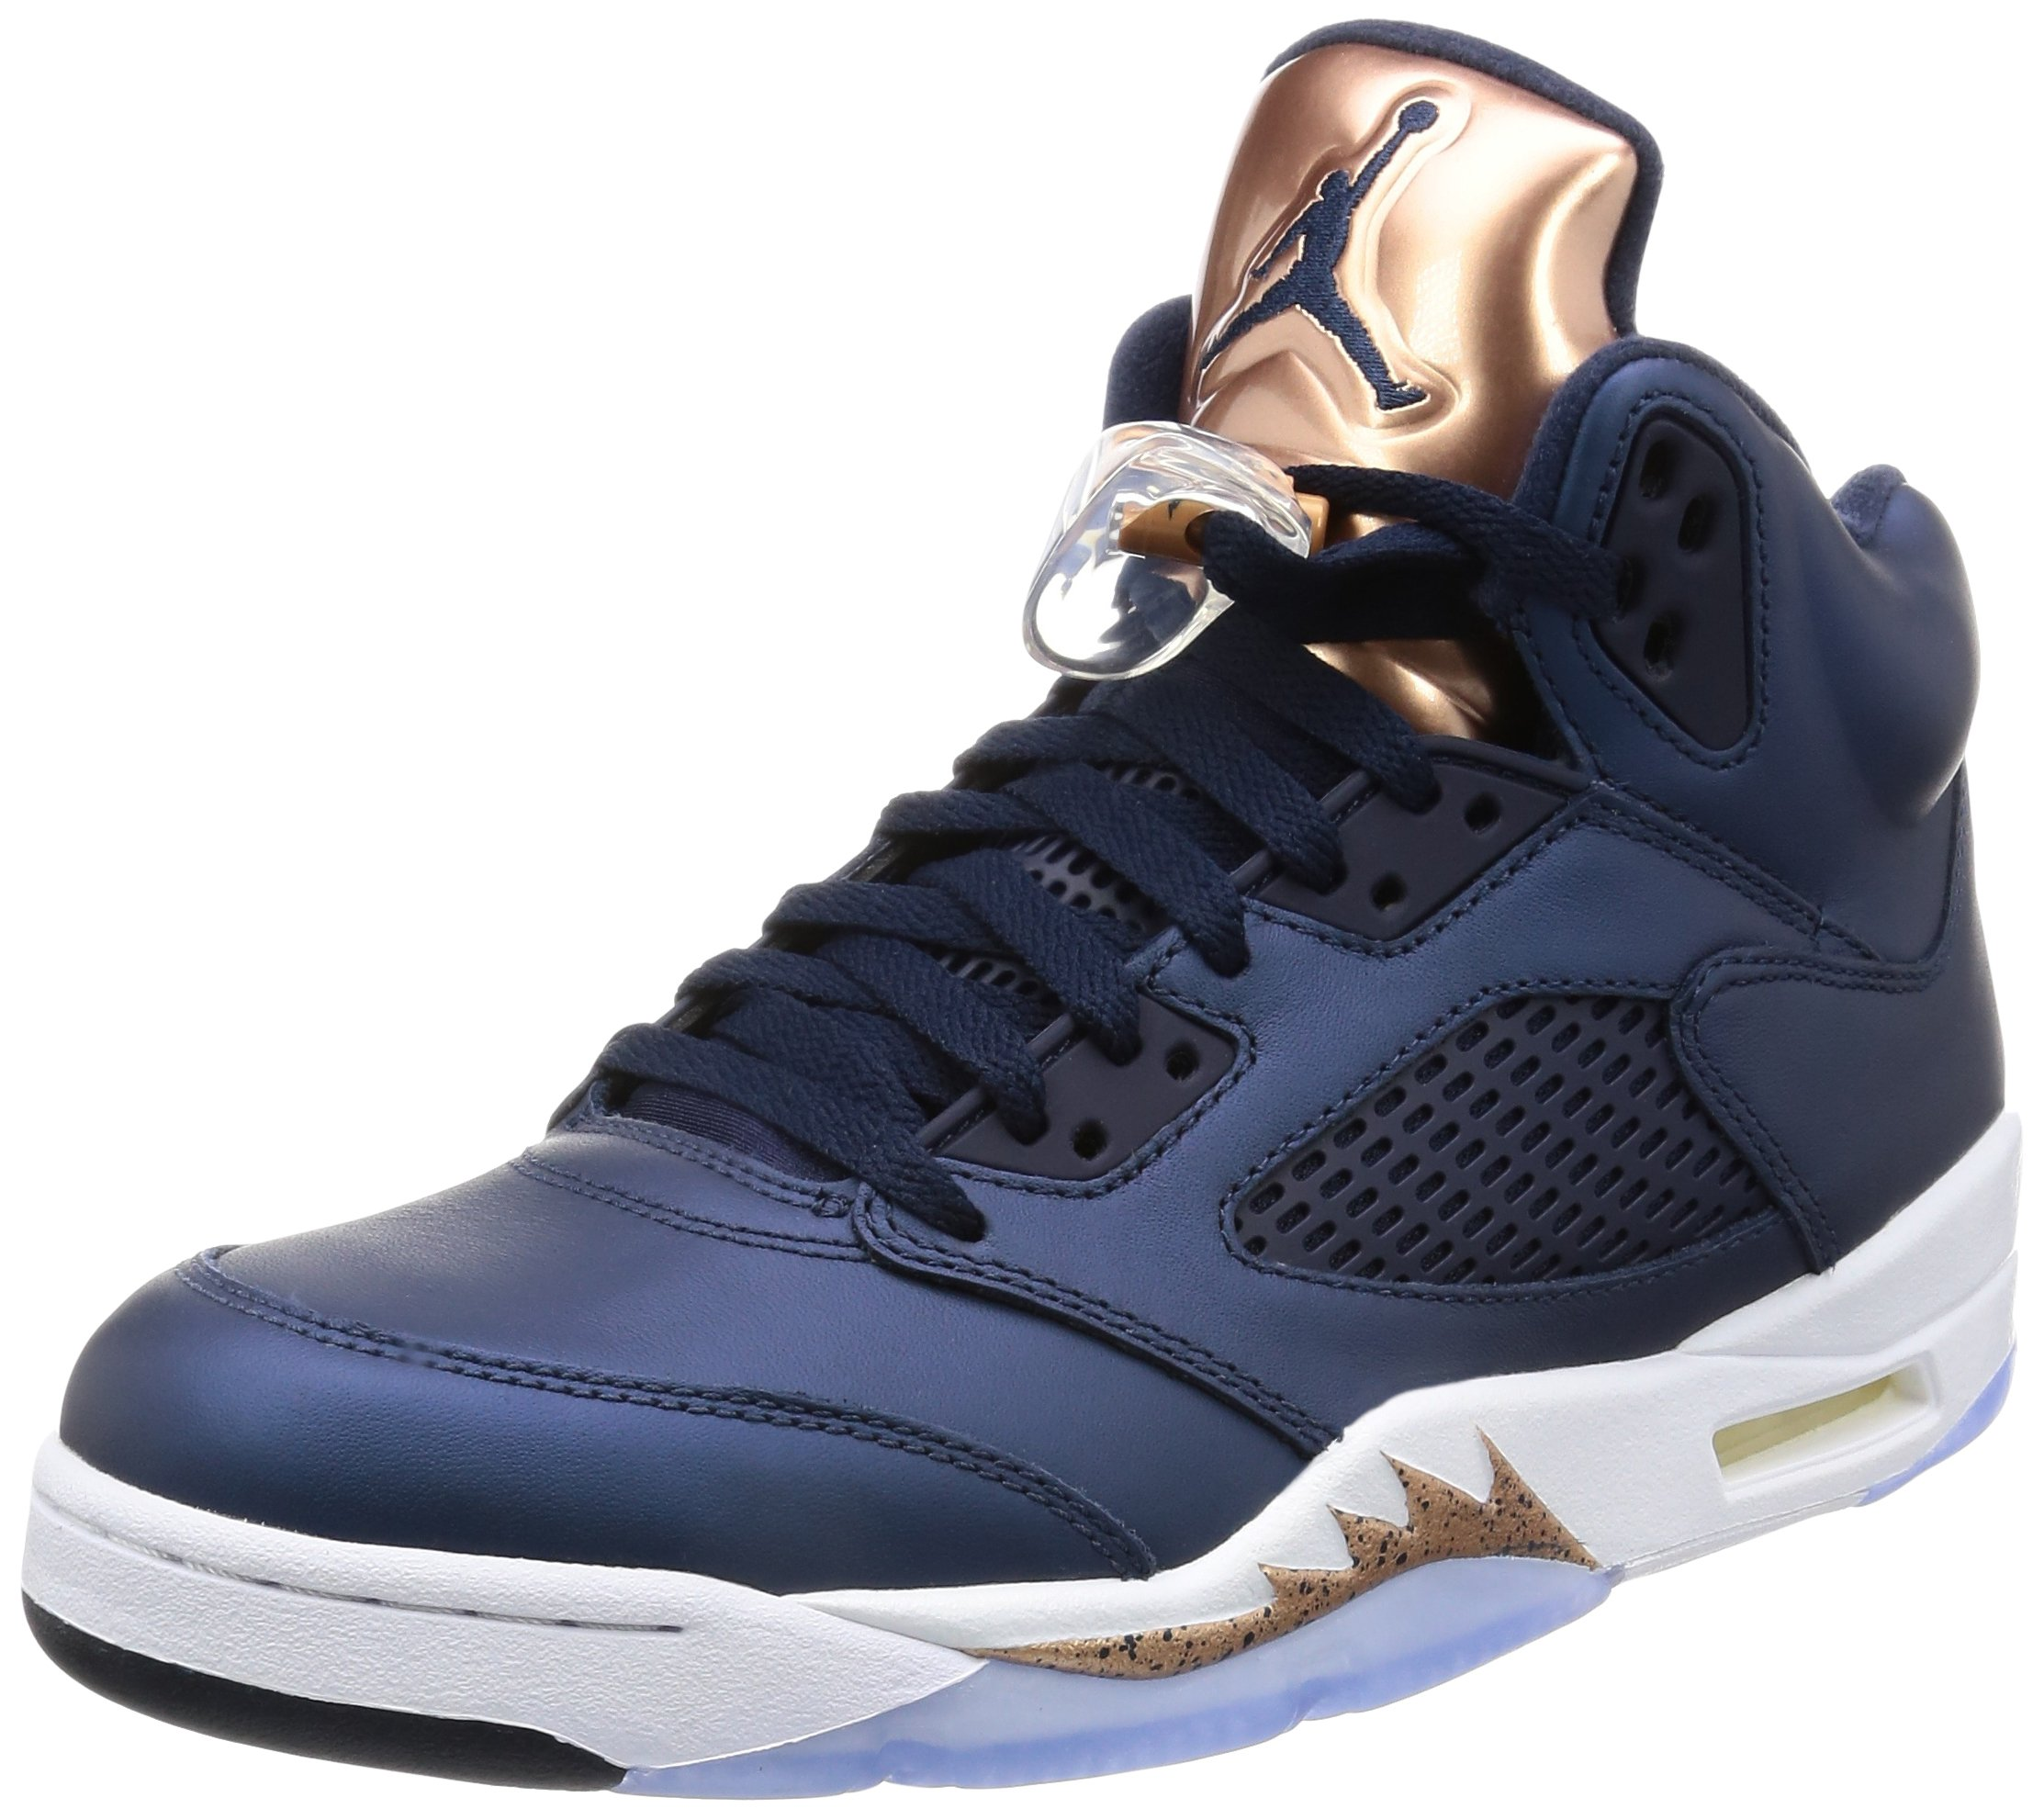 big sale 86833 bf7e6 Galleon - NIKE Jordan Men s Air Jordan 5 Retro Basketball Shoe (12 D(M) US,  Obsidian Metallic Red Bronze Bright Grape White)